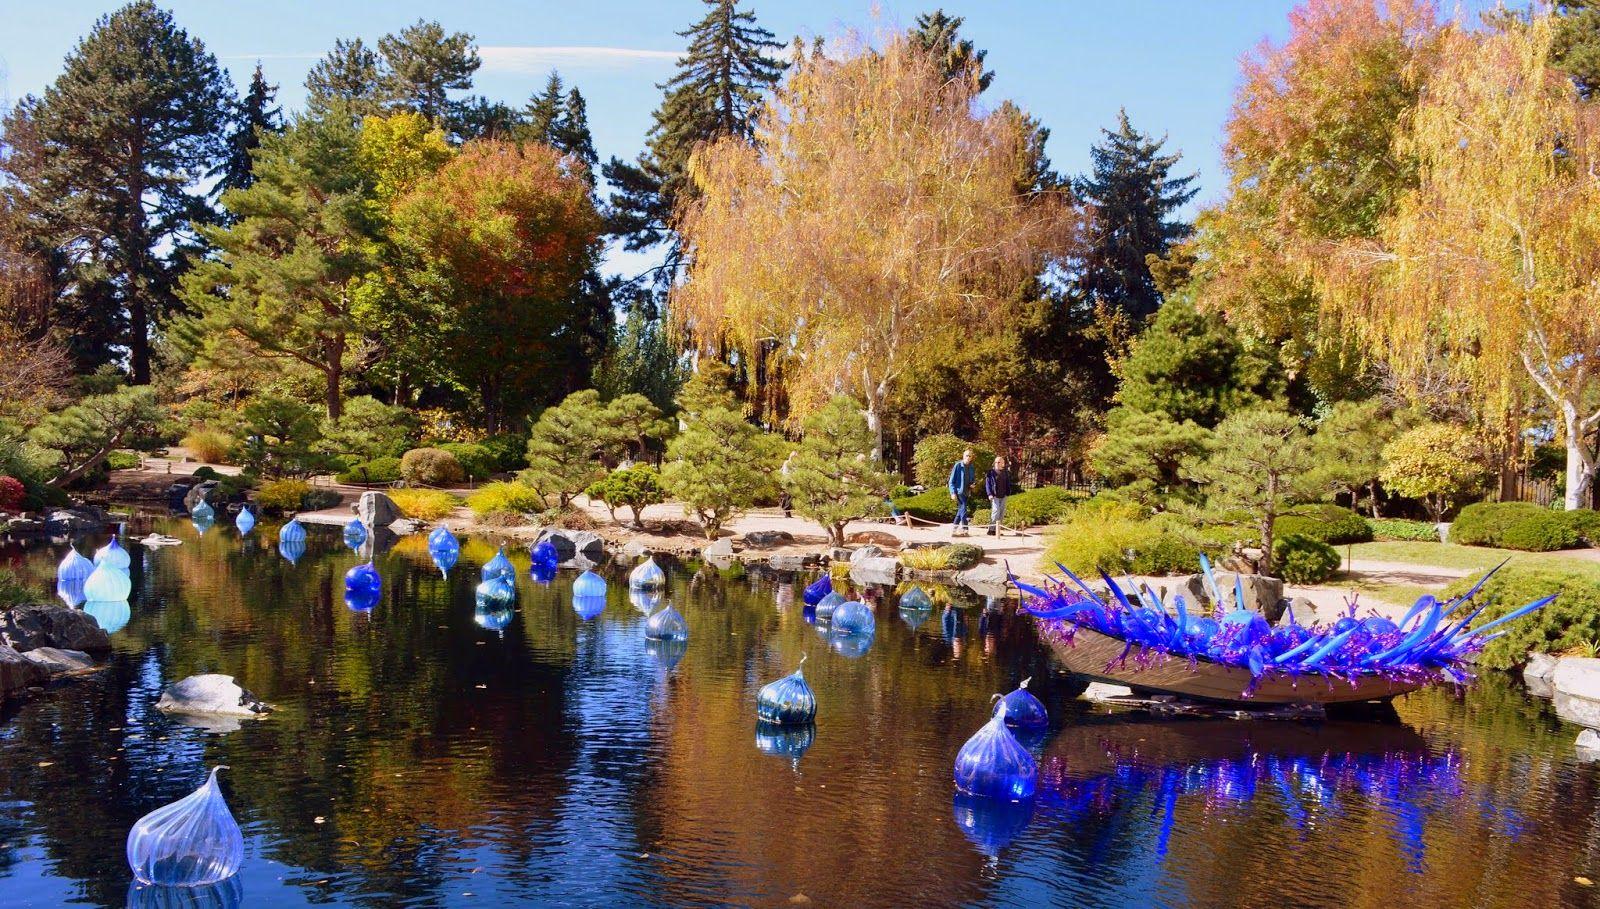 Chihuly Exhibit at the Denver Botanic Garden | Pinterest | Dale ...